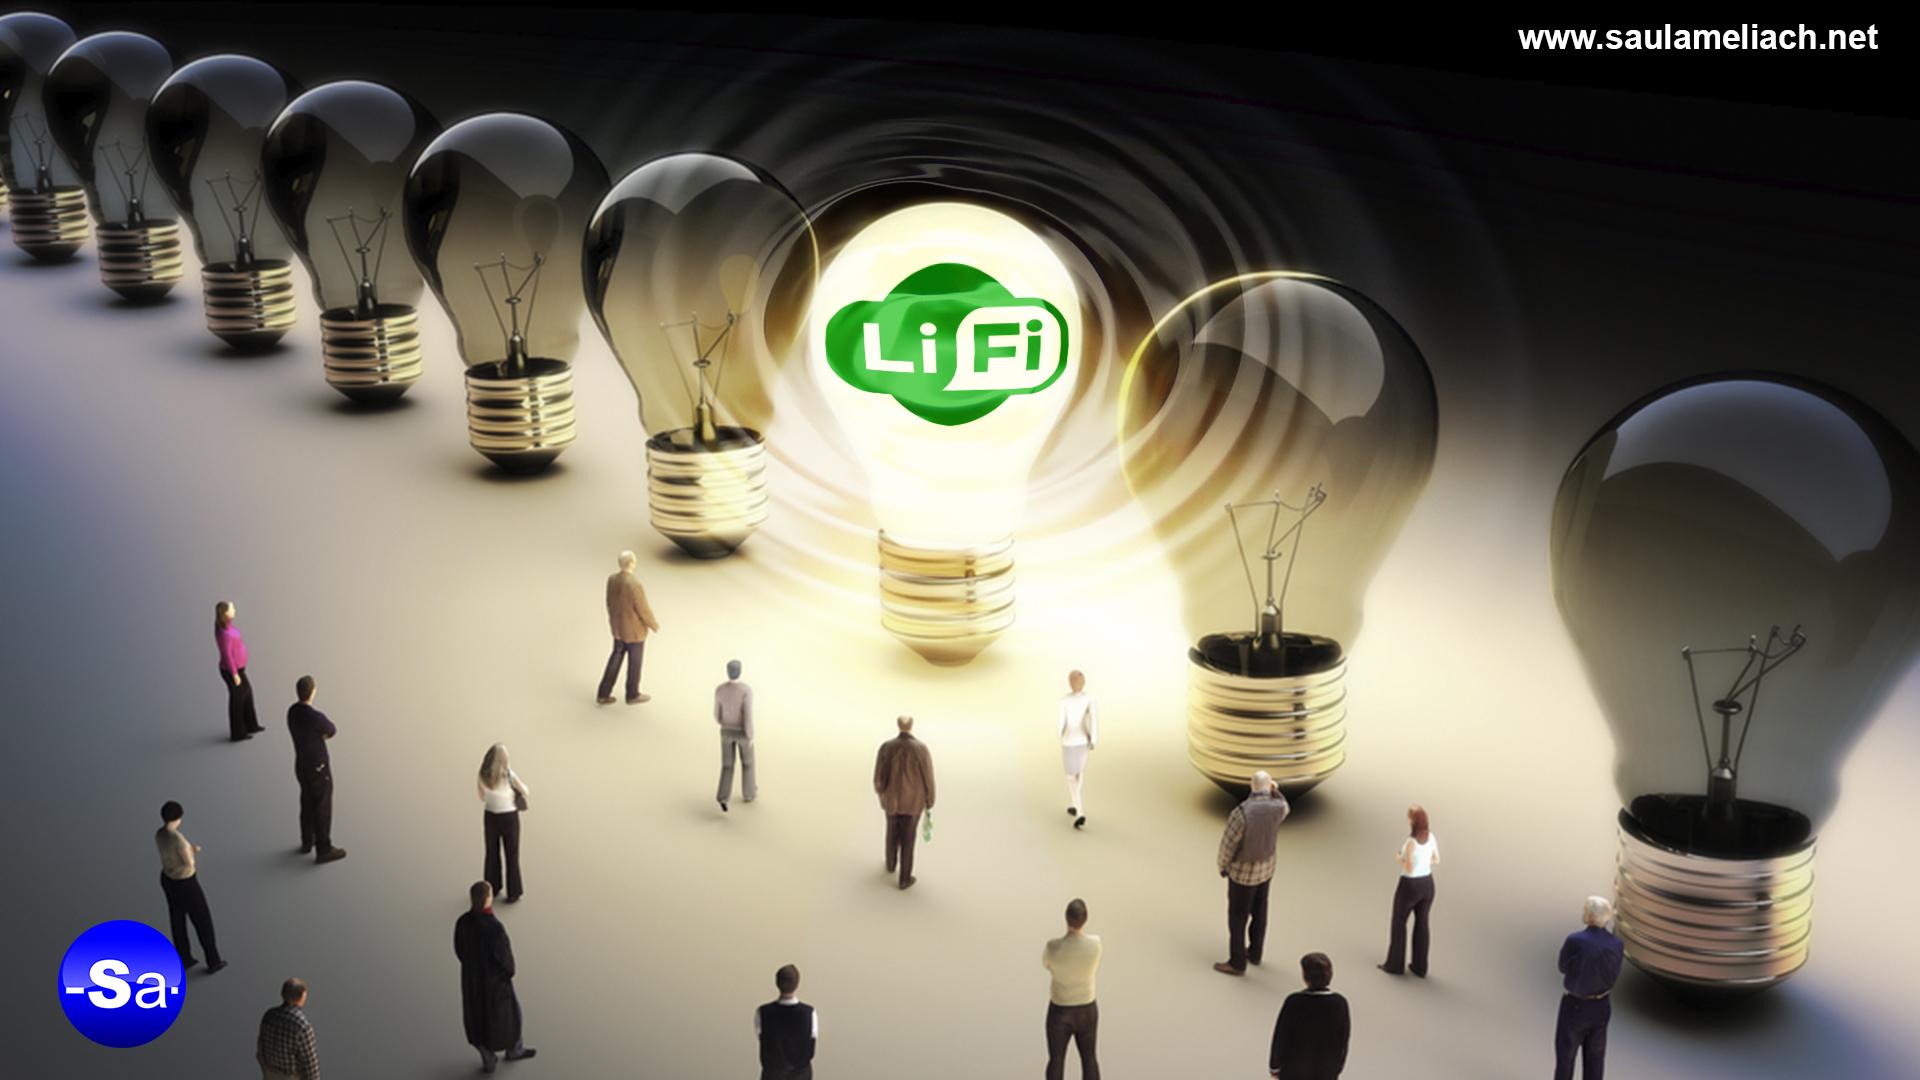 saul ameliach - LiFi - Luz